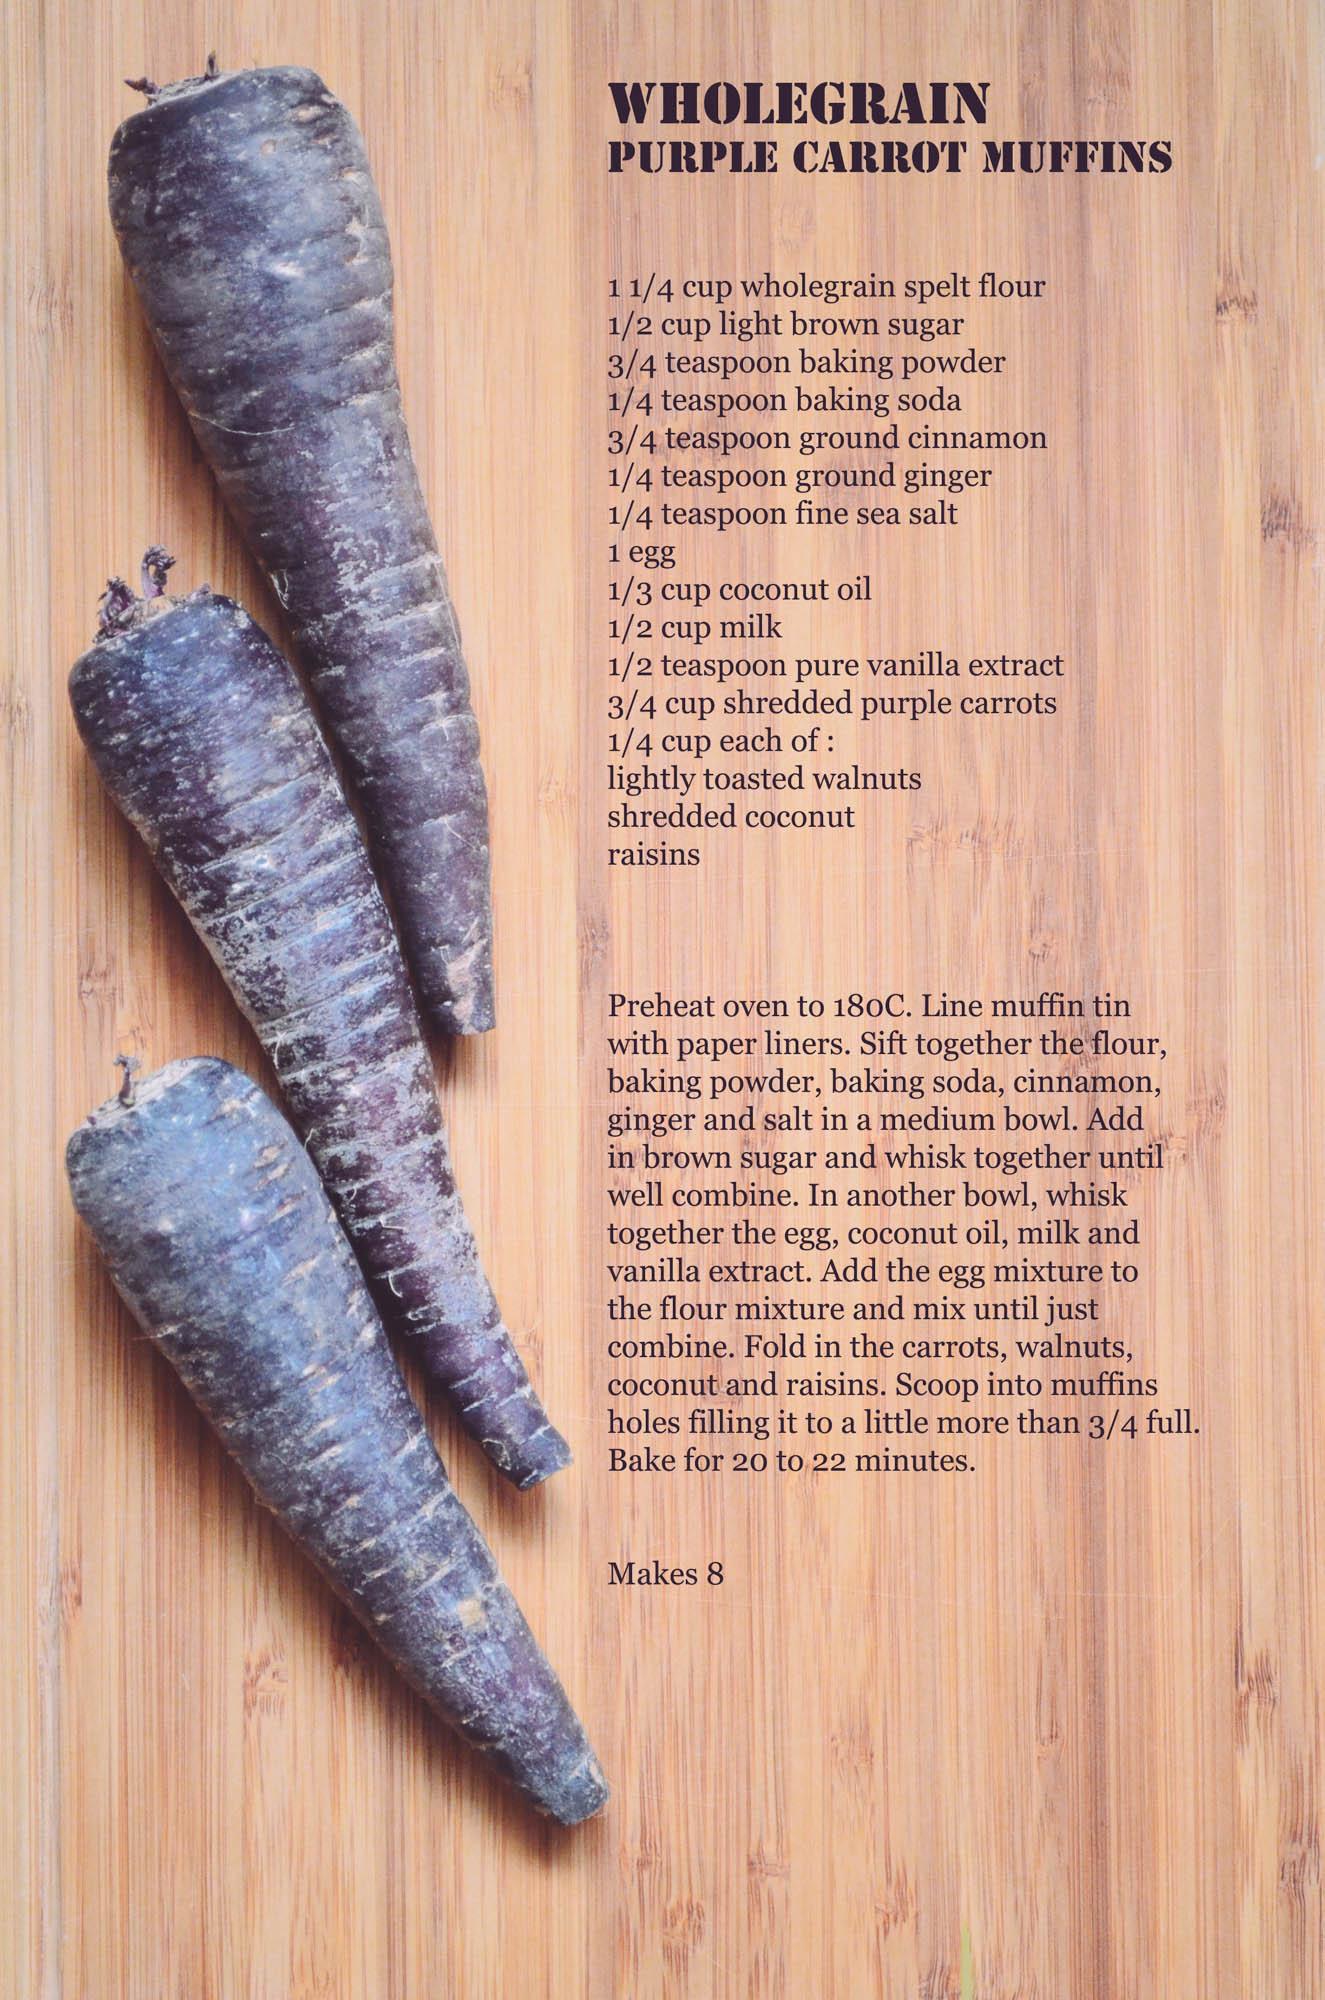 purple carrot muffins 14-1